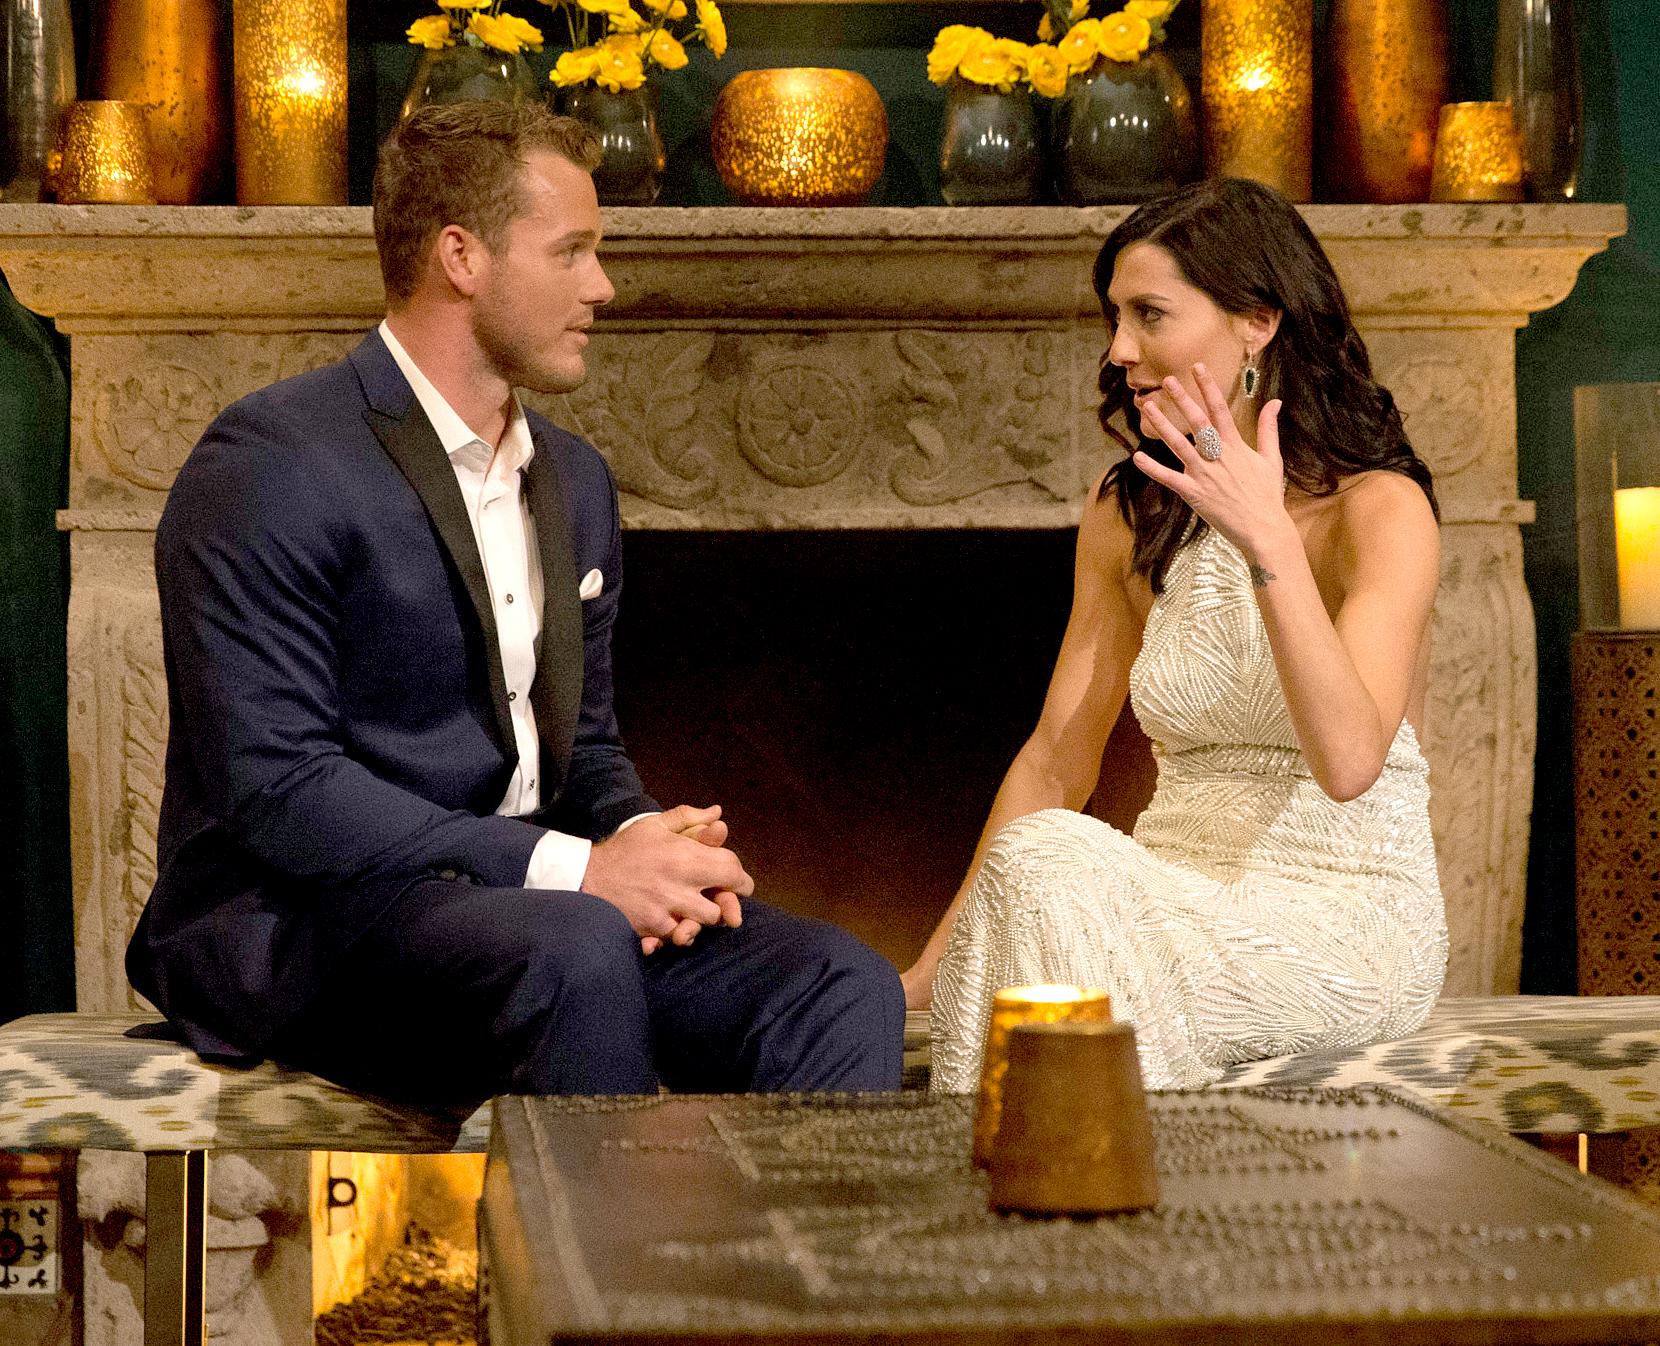 becca-colton-bachelor - Colton and Becca on The Bachelorette